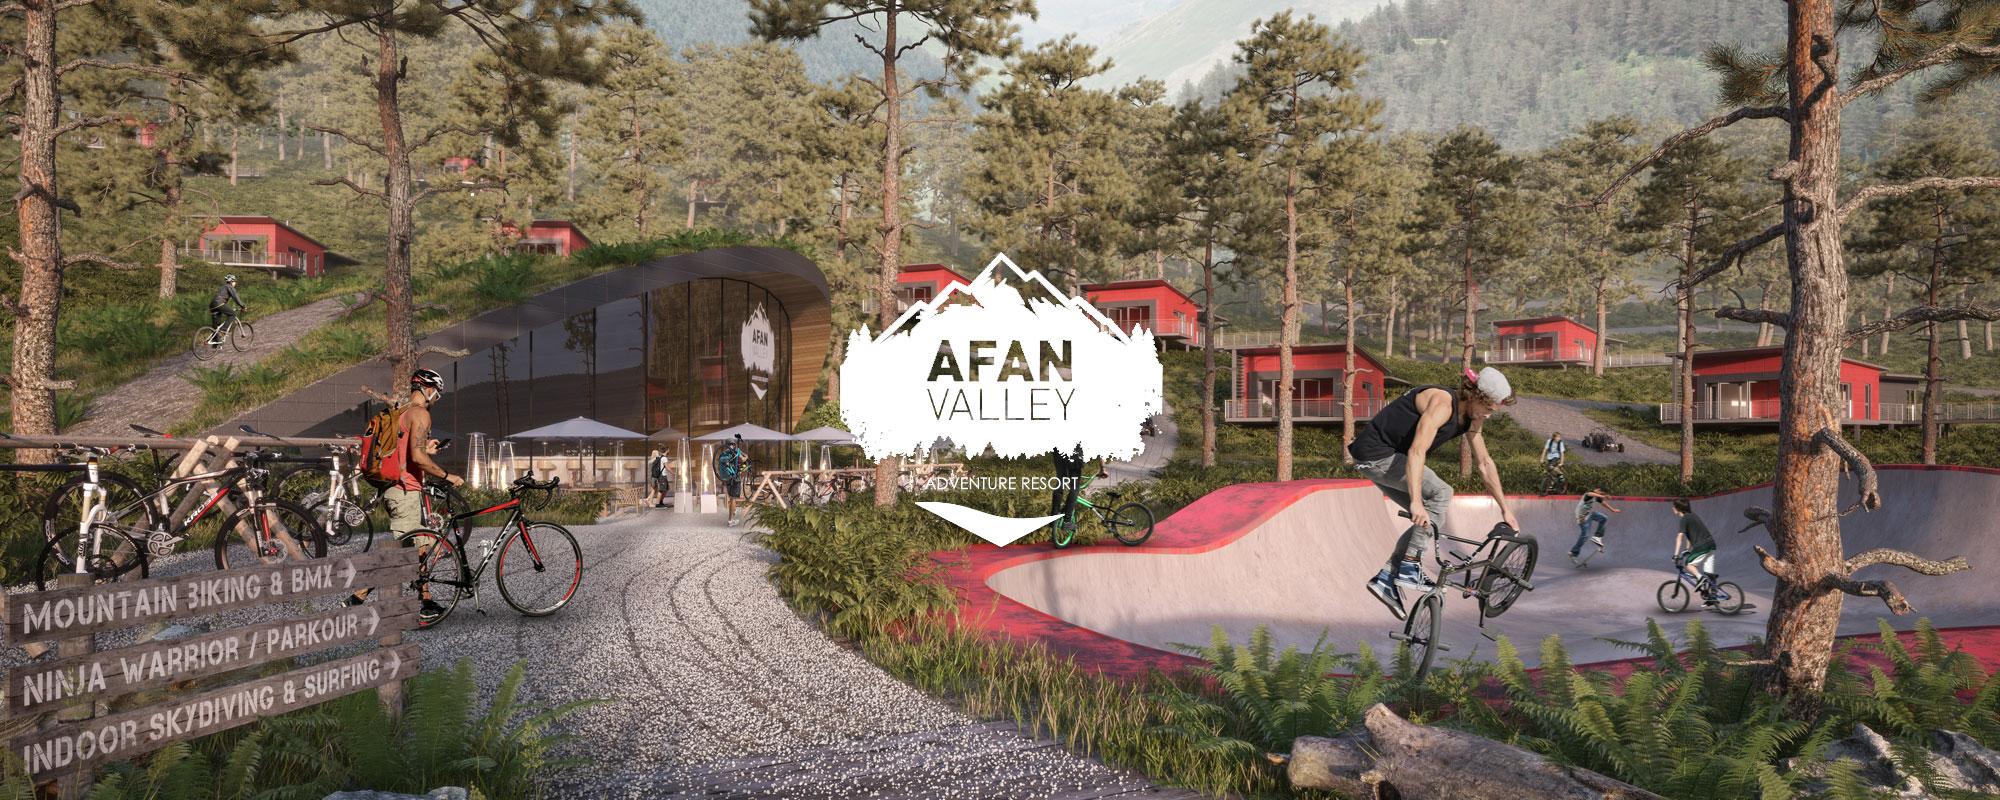 Afan Valley Adventure Resort Xtreme Zone